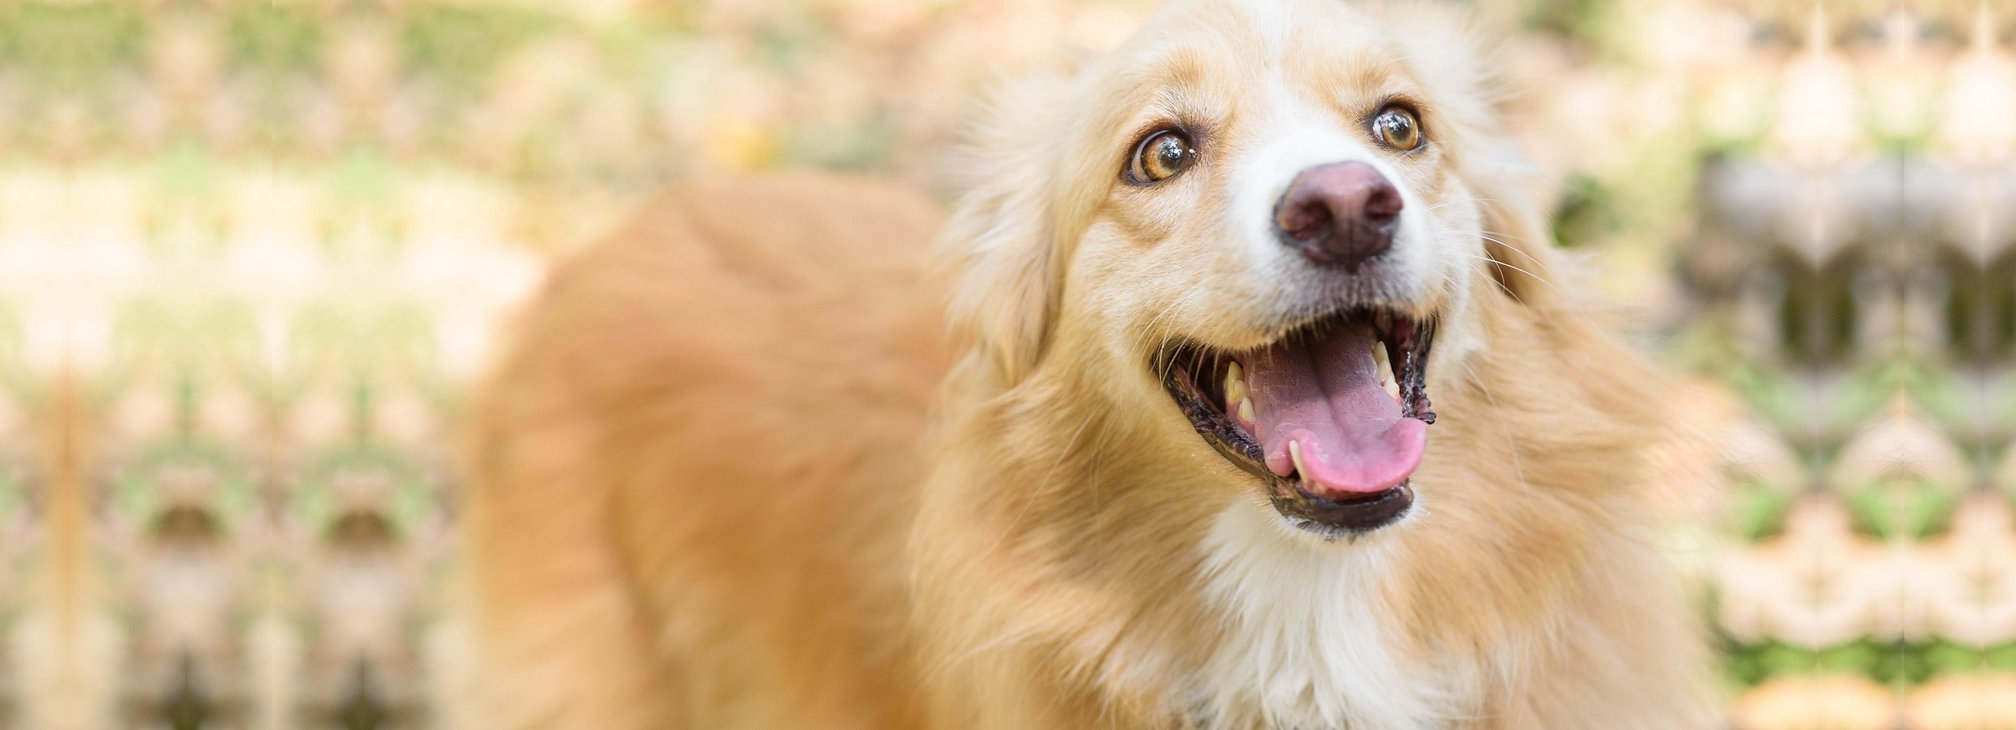 Dental Happy dog.jpg